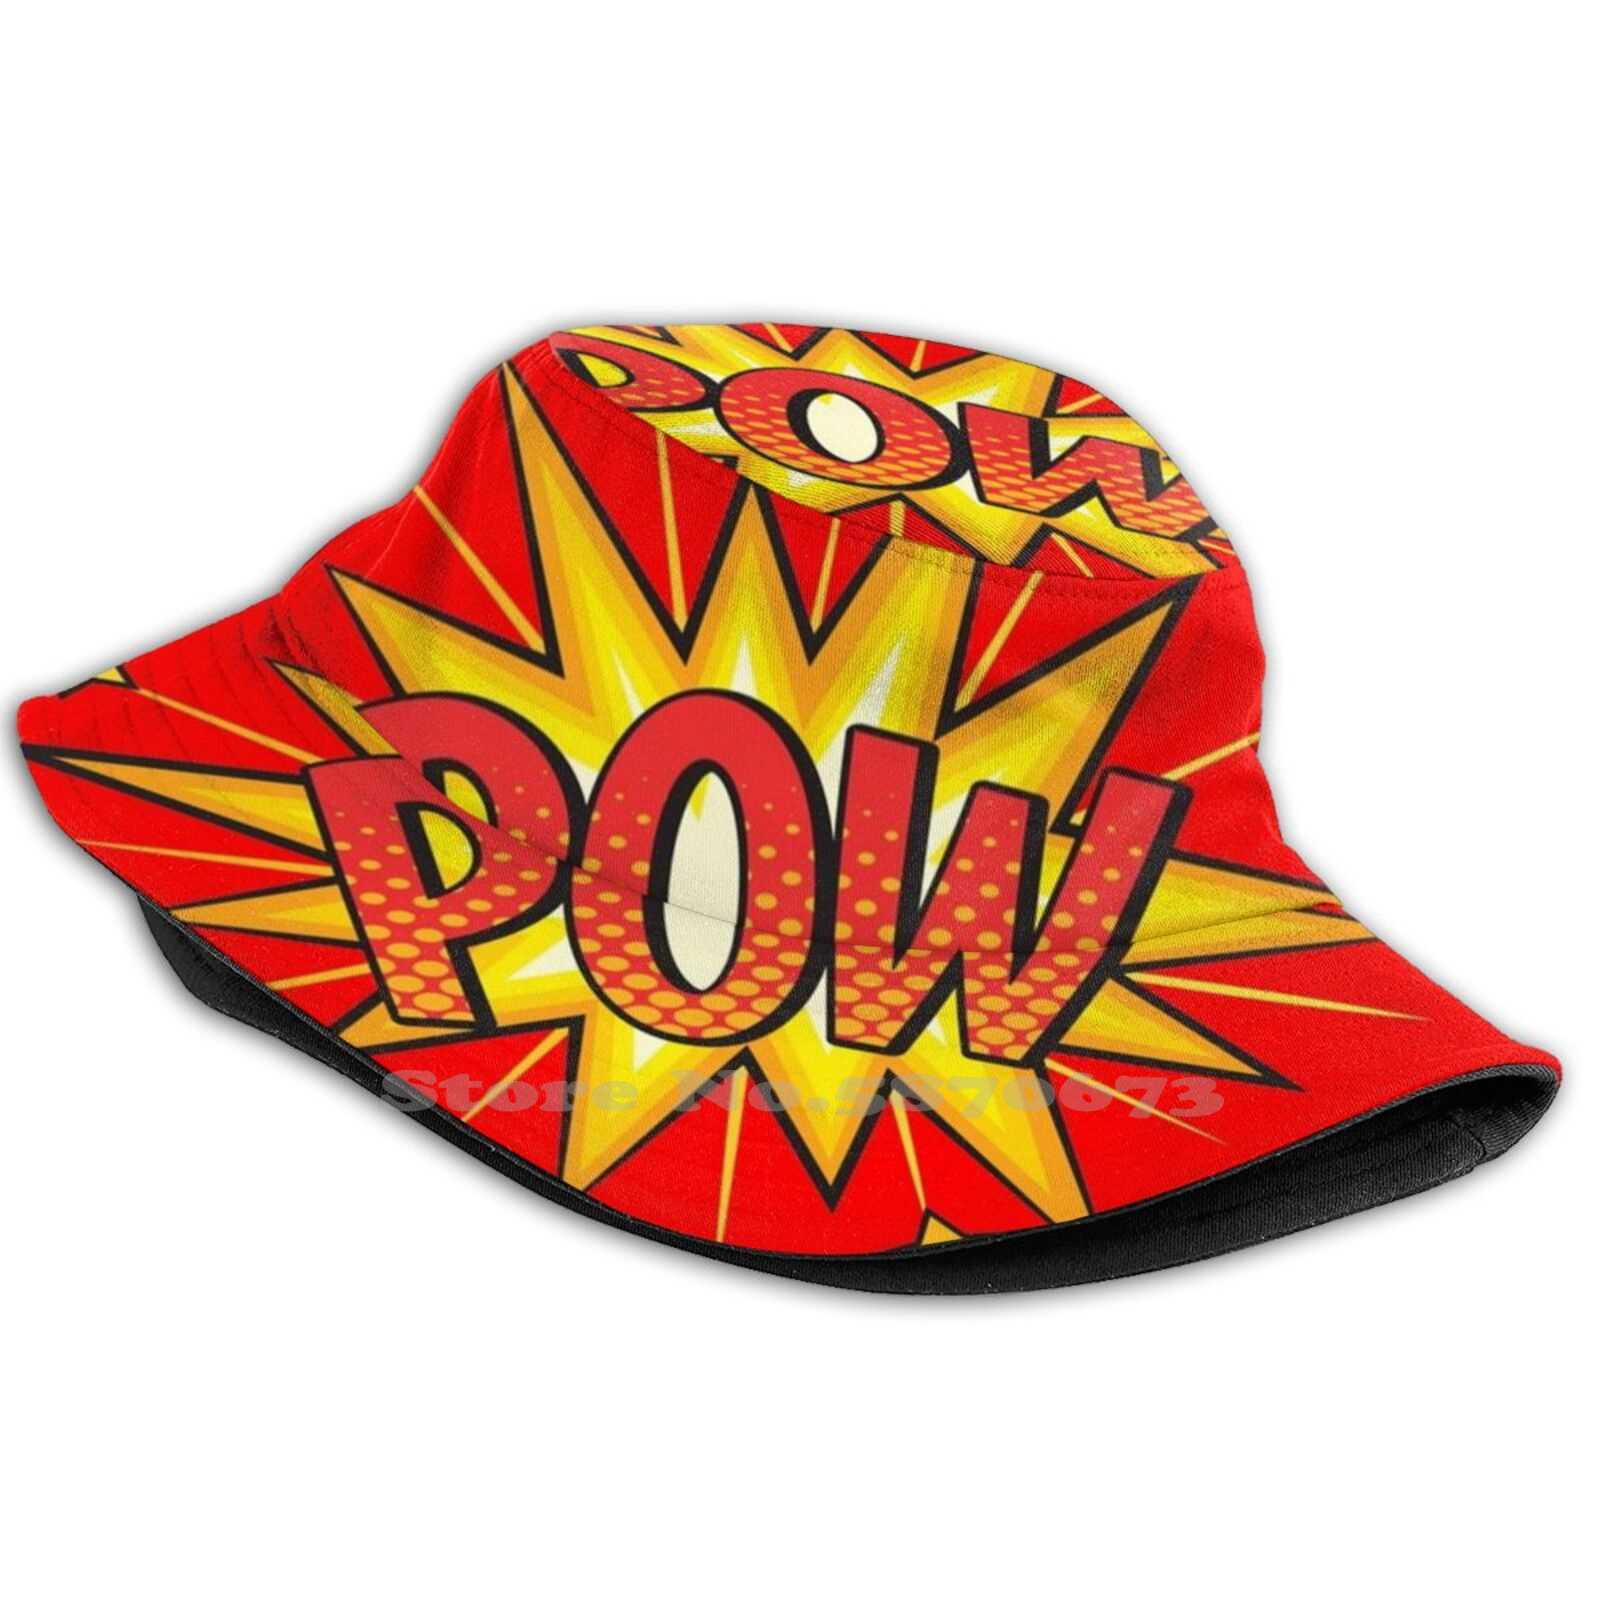 Pow! Uv Protection Foldable Bucket Hats Women Men Cosplay Love Friend Superhero Shazam Dark Horse Ironman Incredibles 19